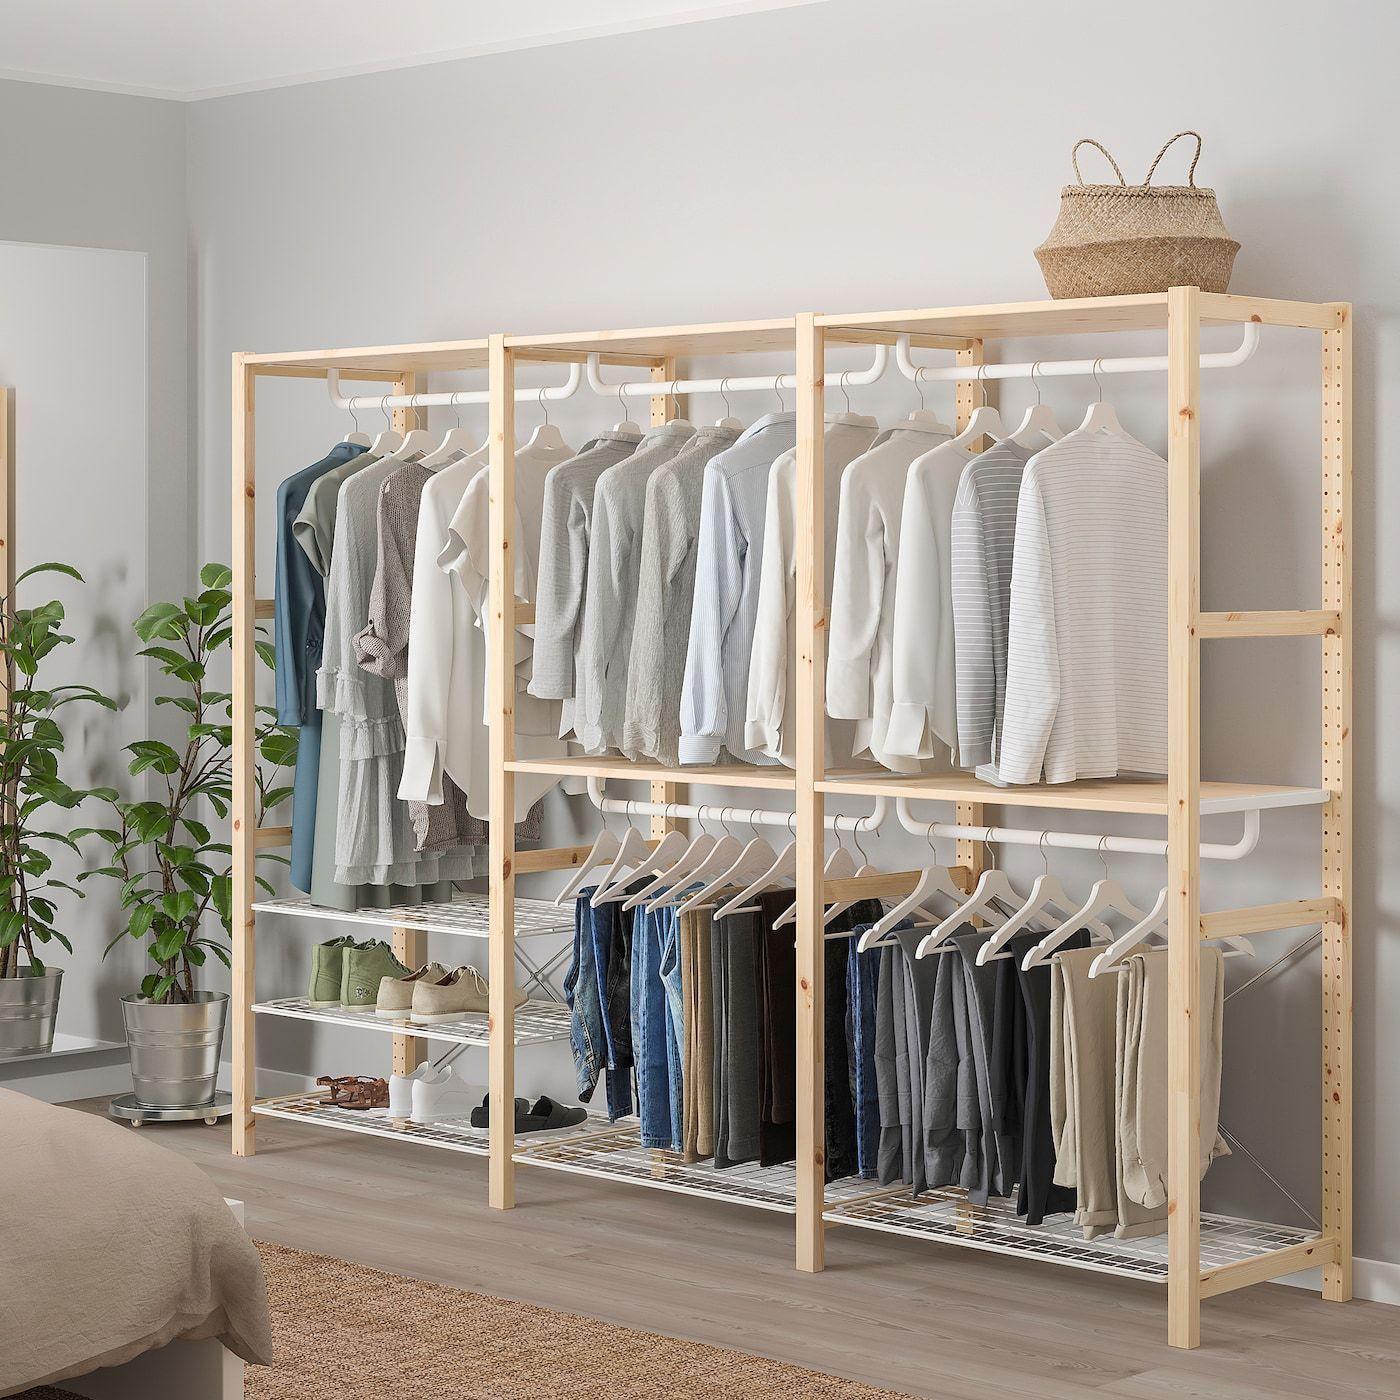 Ivar Shelving Unit With Shelves Rails Pine Ikea In 2020 Shelves In Bedroom Bedroom Closet Design Ikea Wardrobe